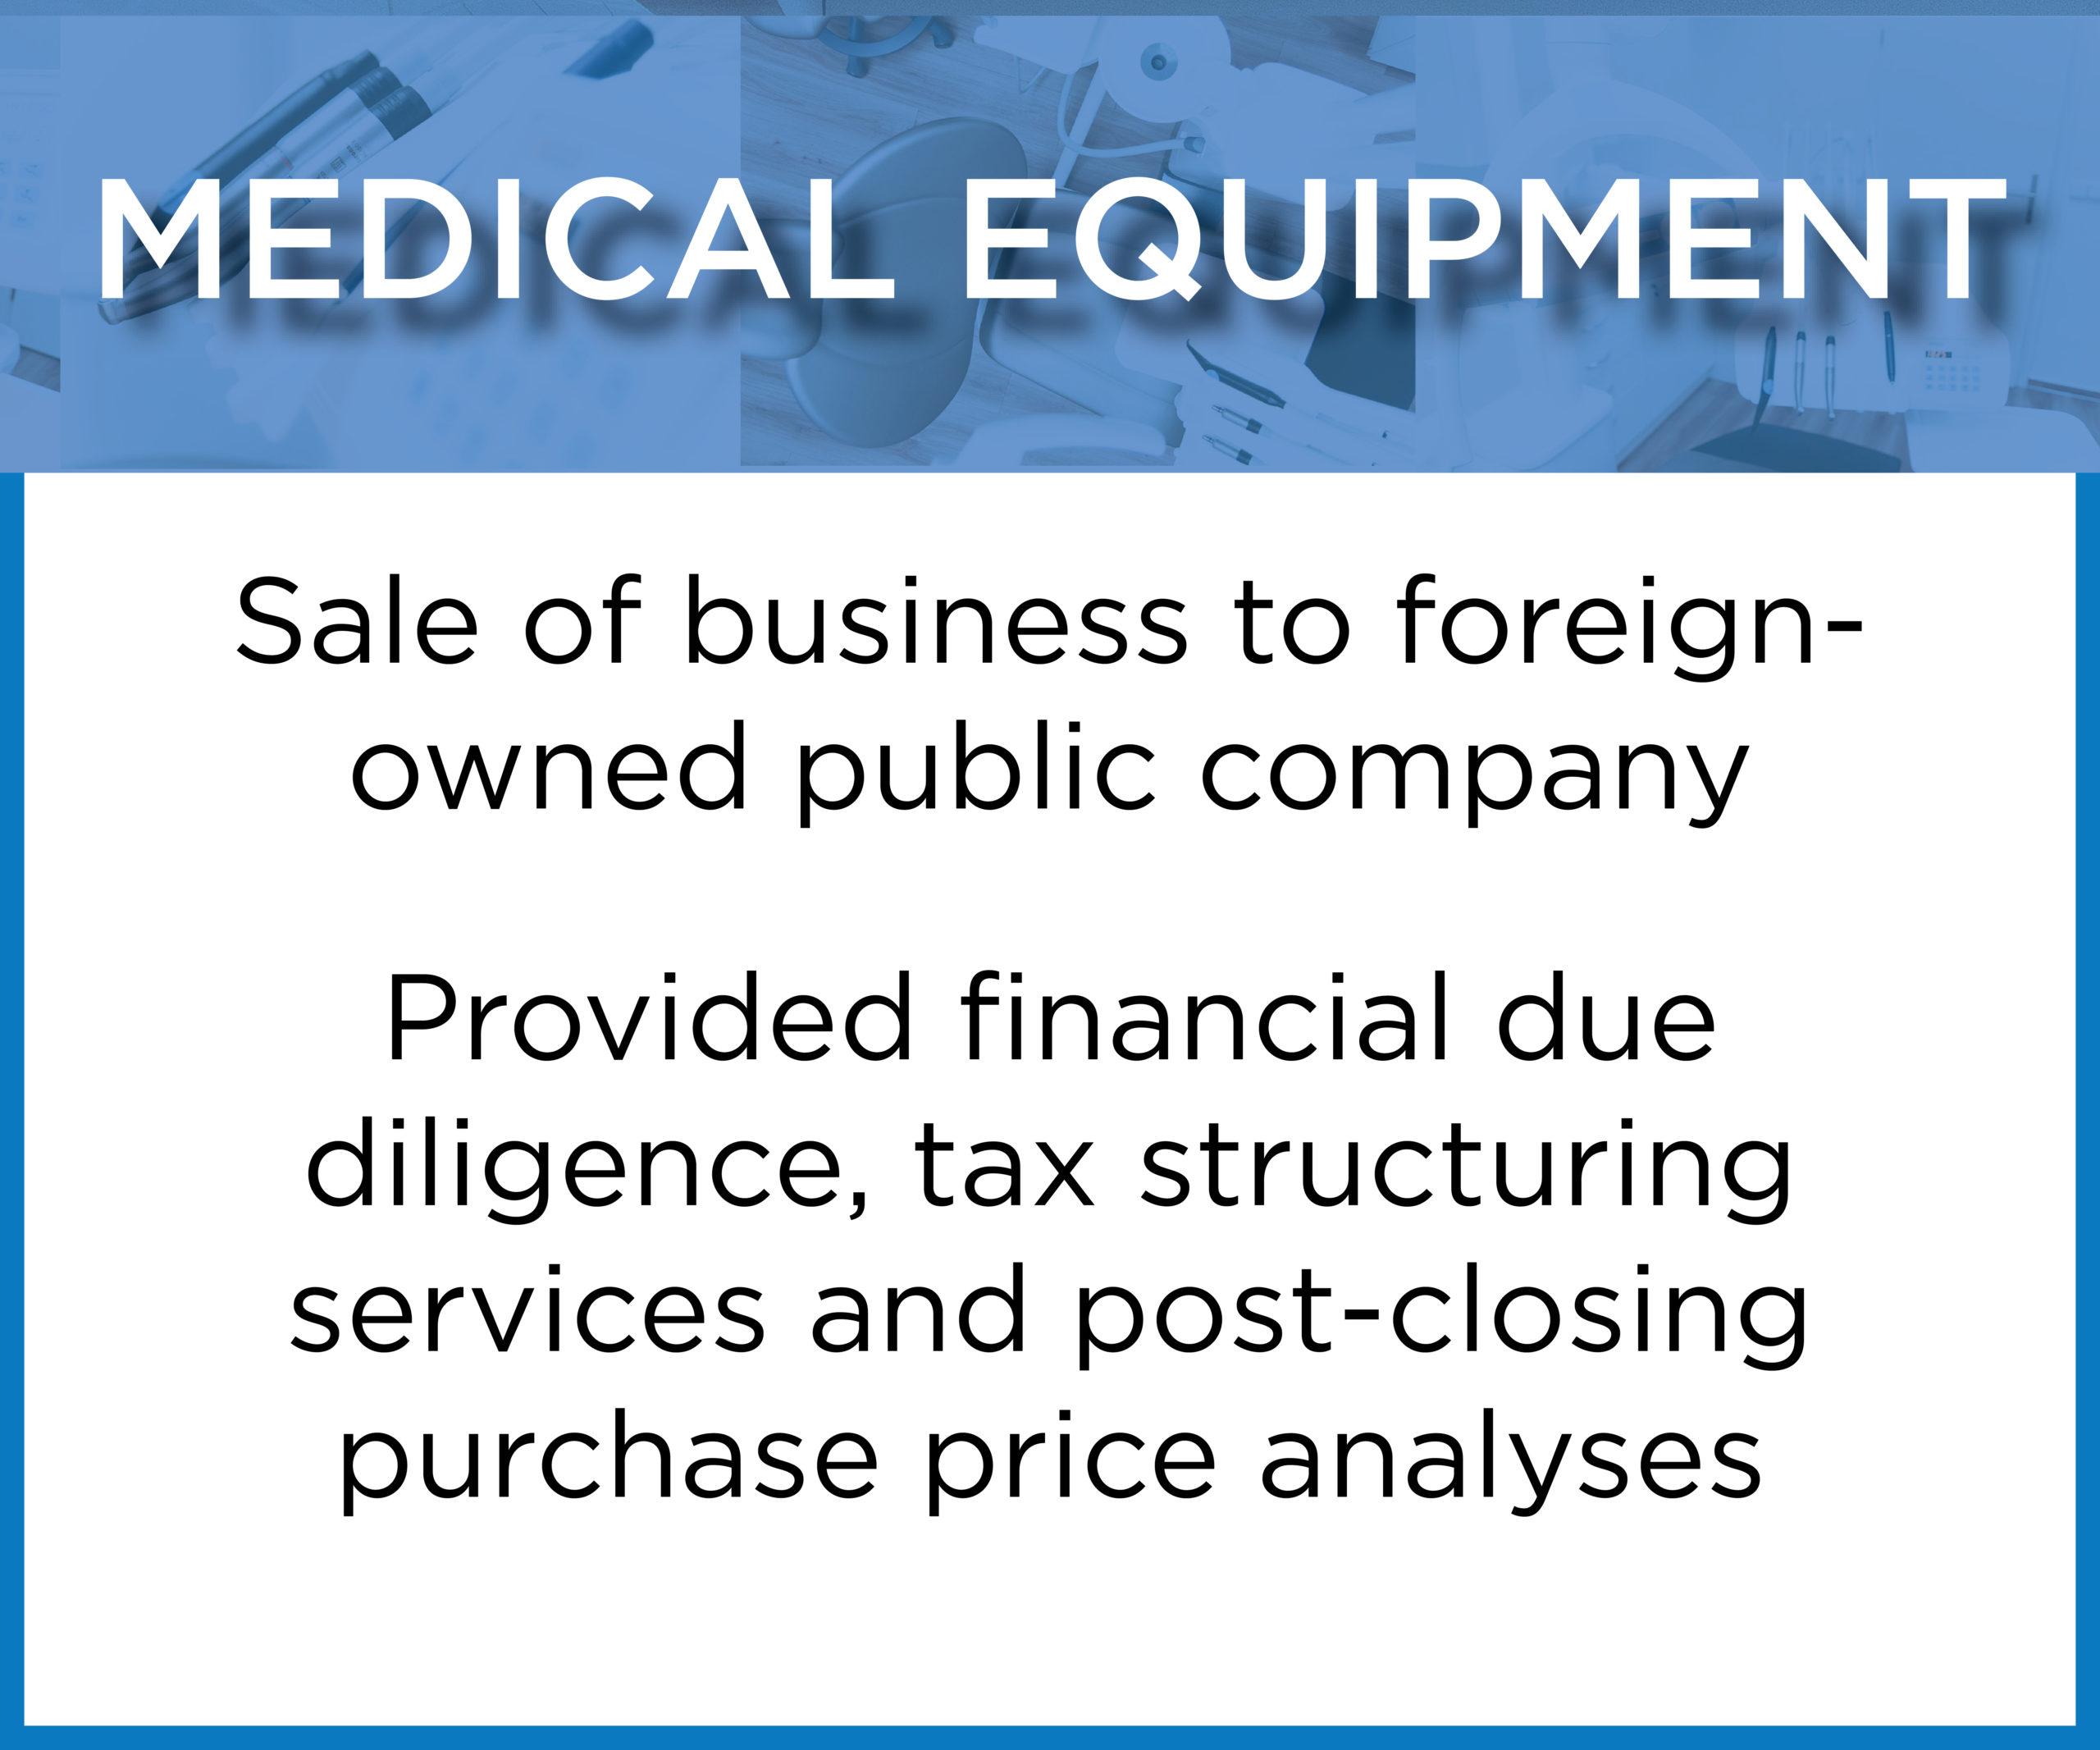 Medical Equipment_Final